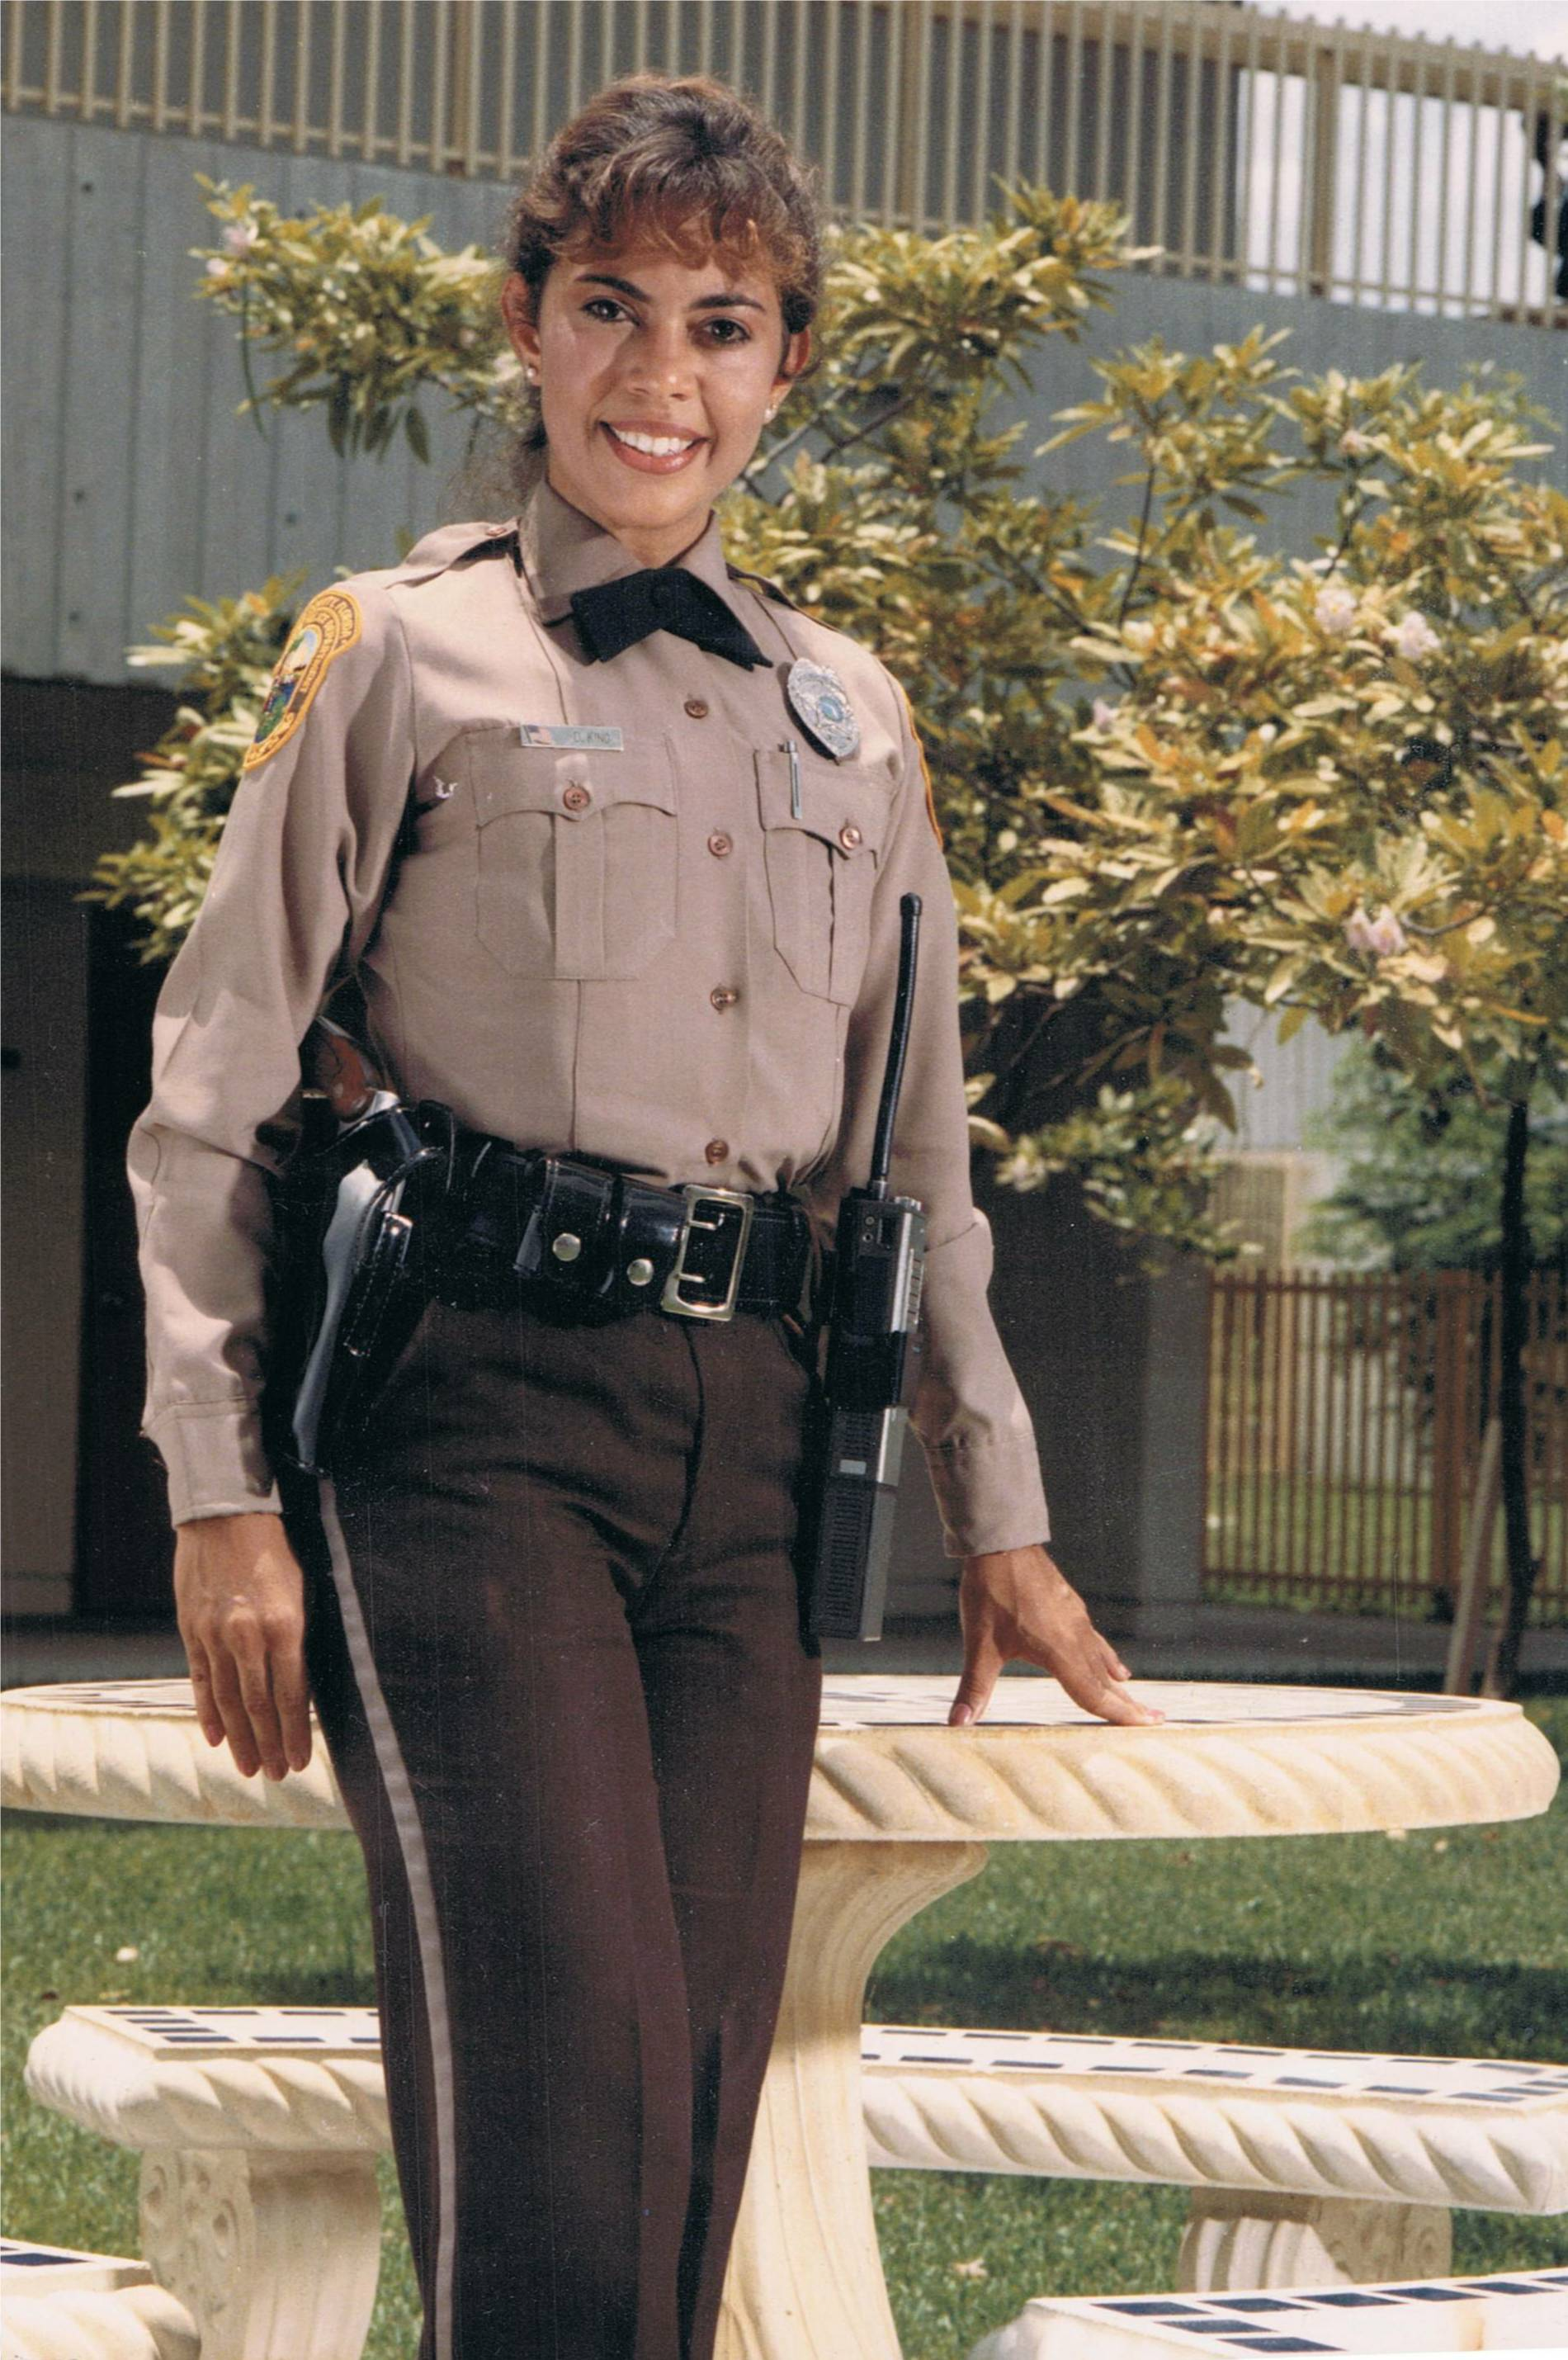 Police Years – Daisy Raisler